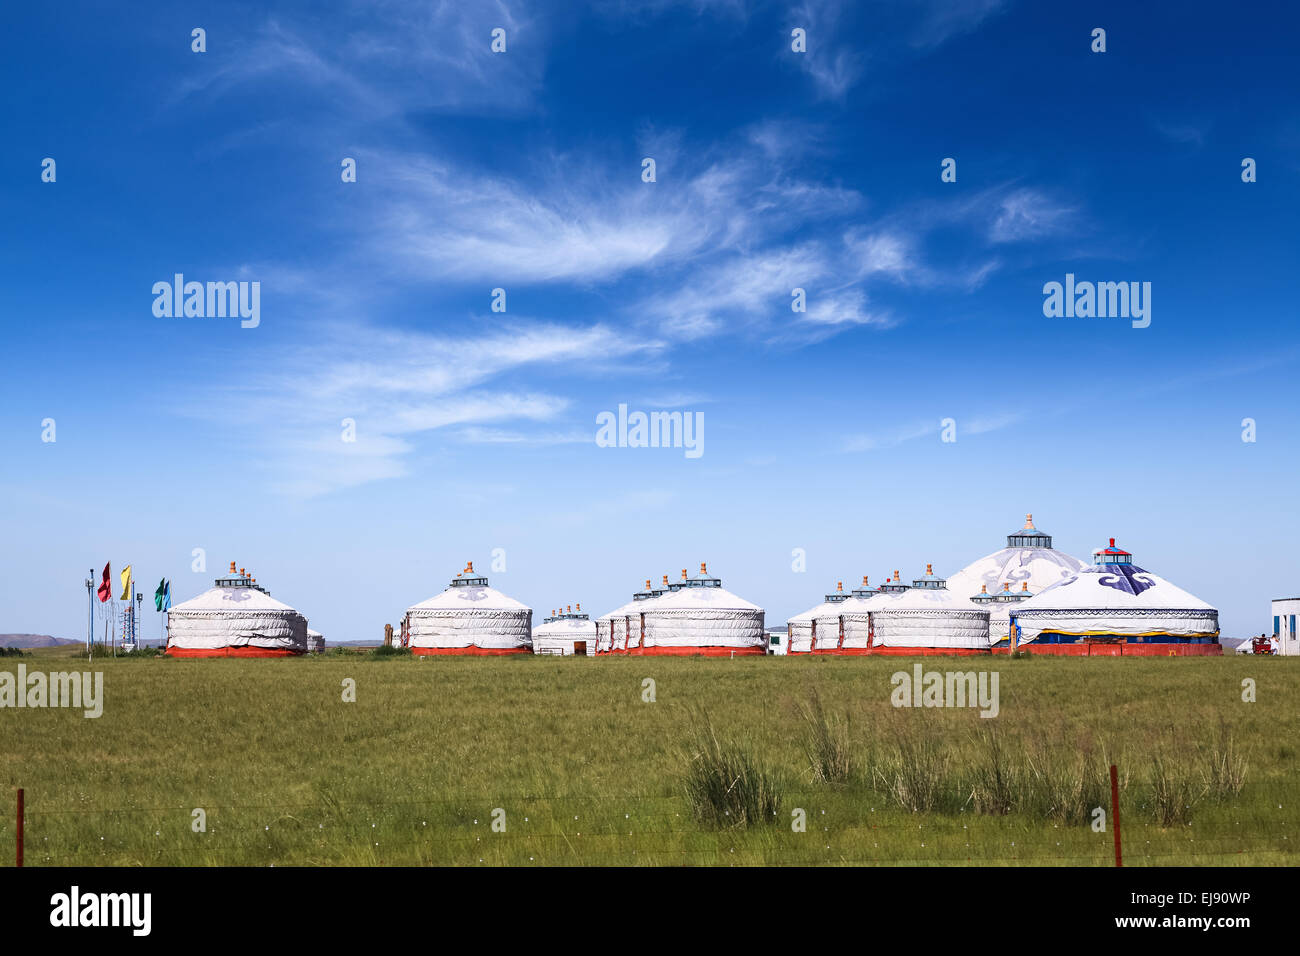 prairie gers - Stock Image